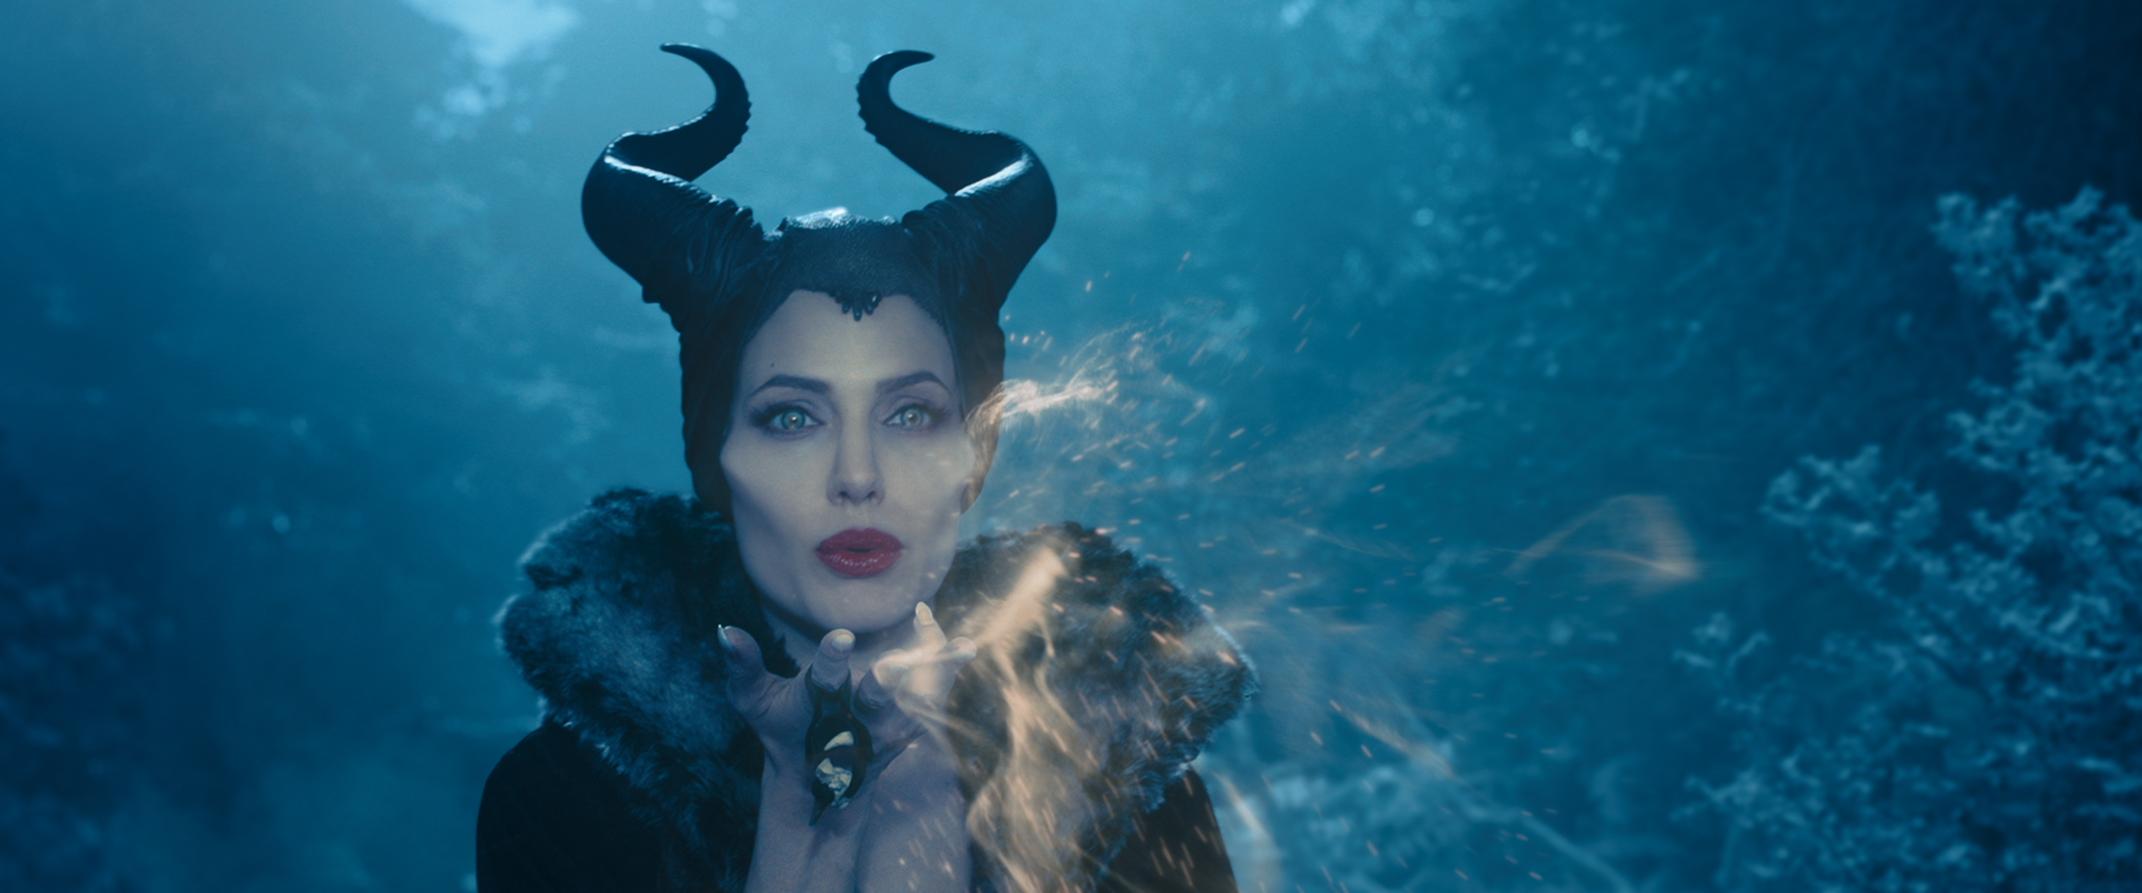 Maleficent heading for UK cinemas